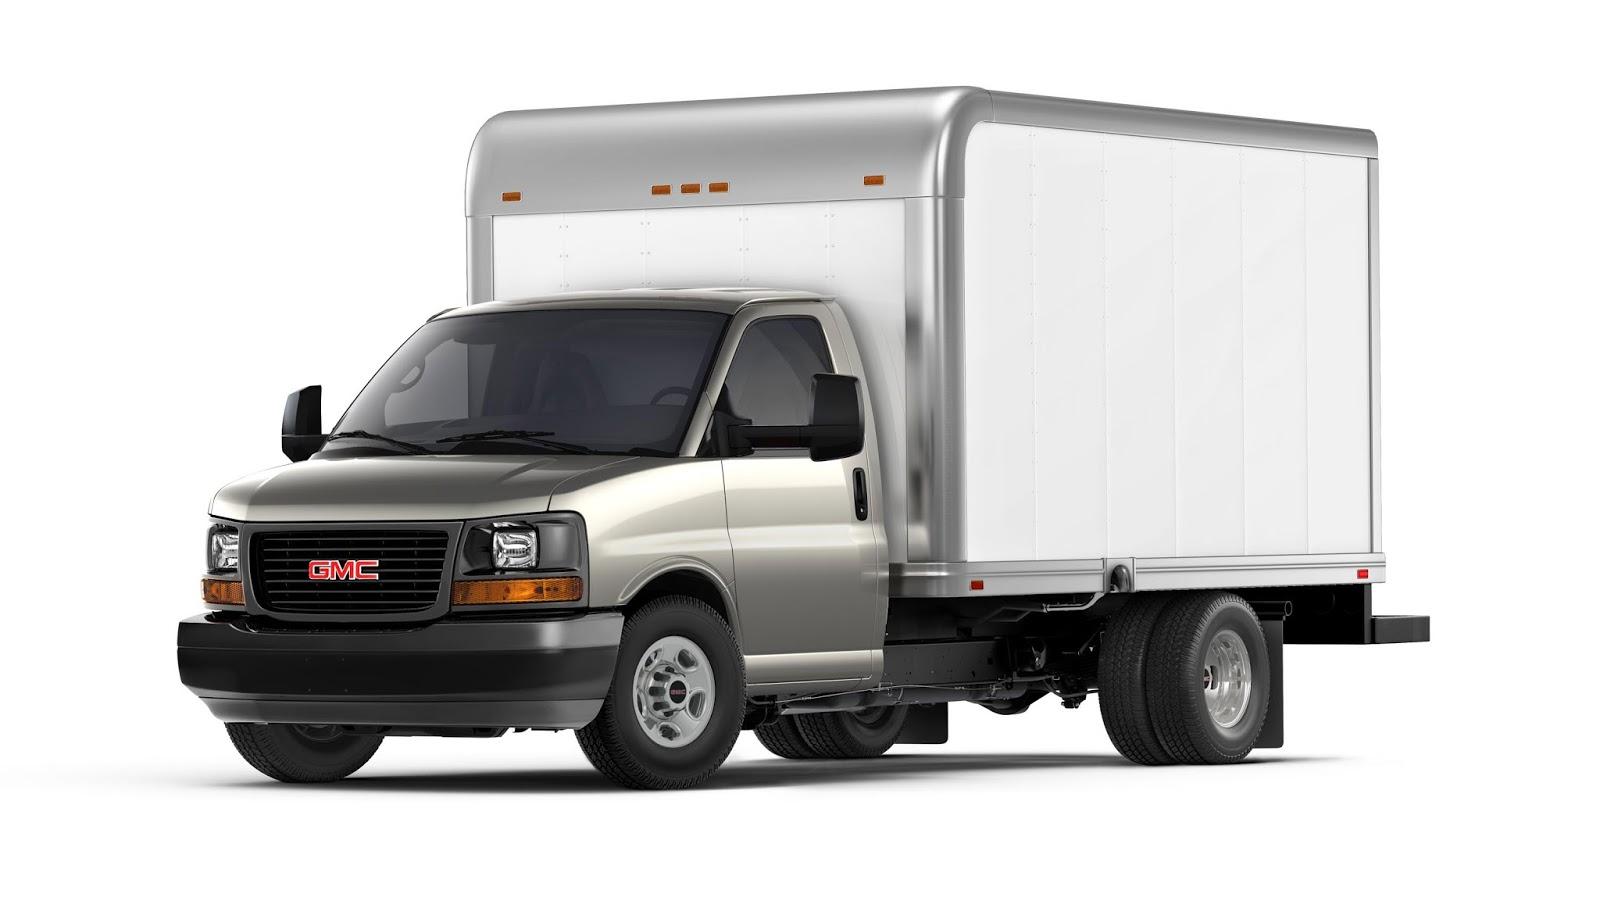 2016 gmc savana cutaway 3500 4500